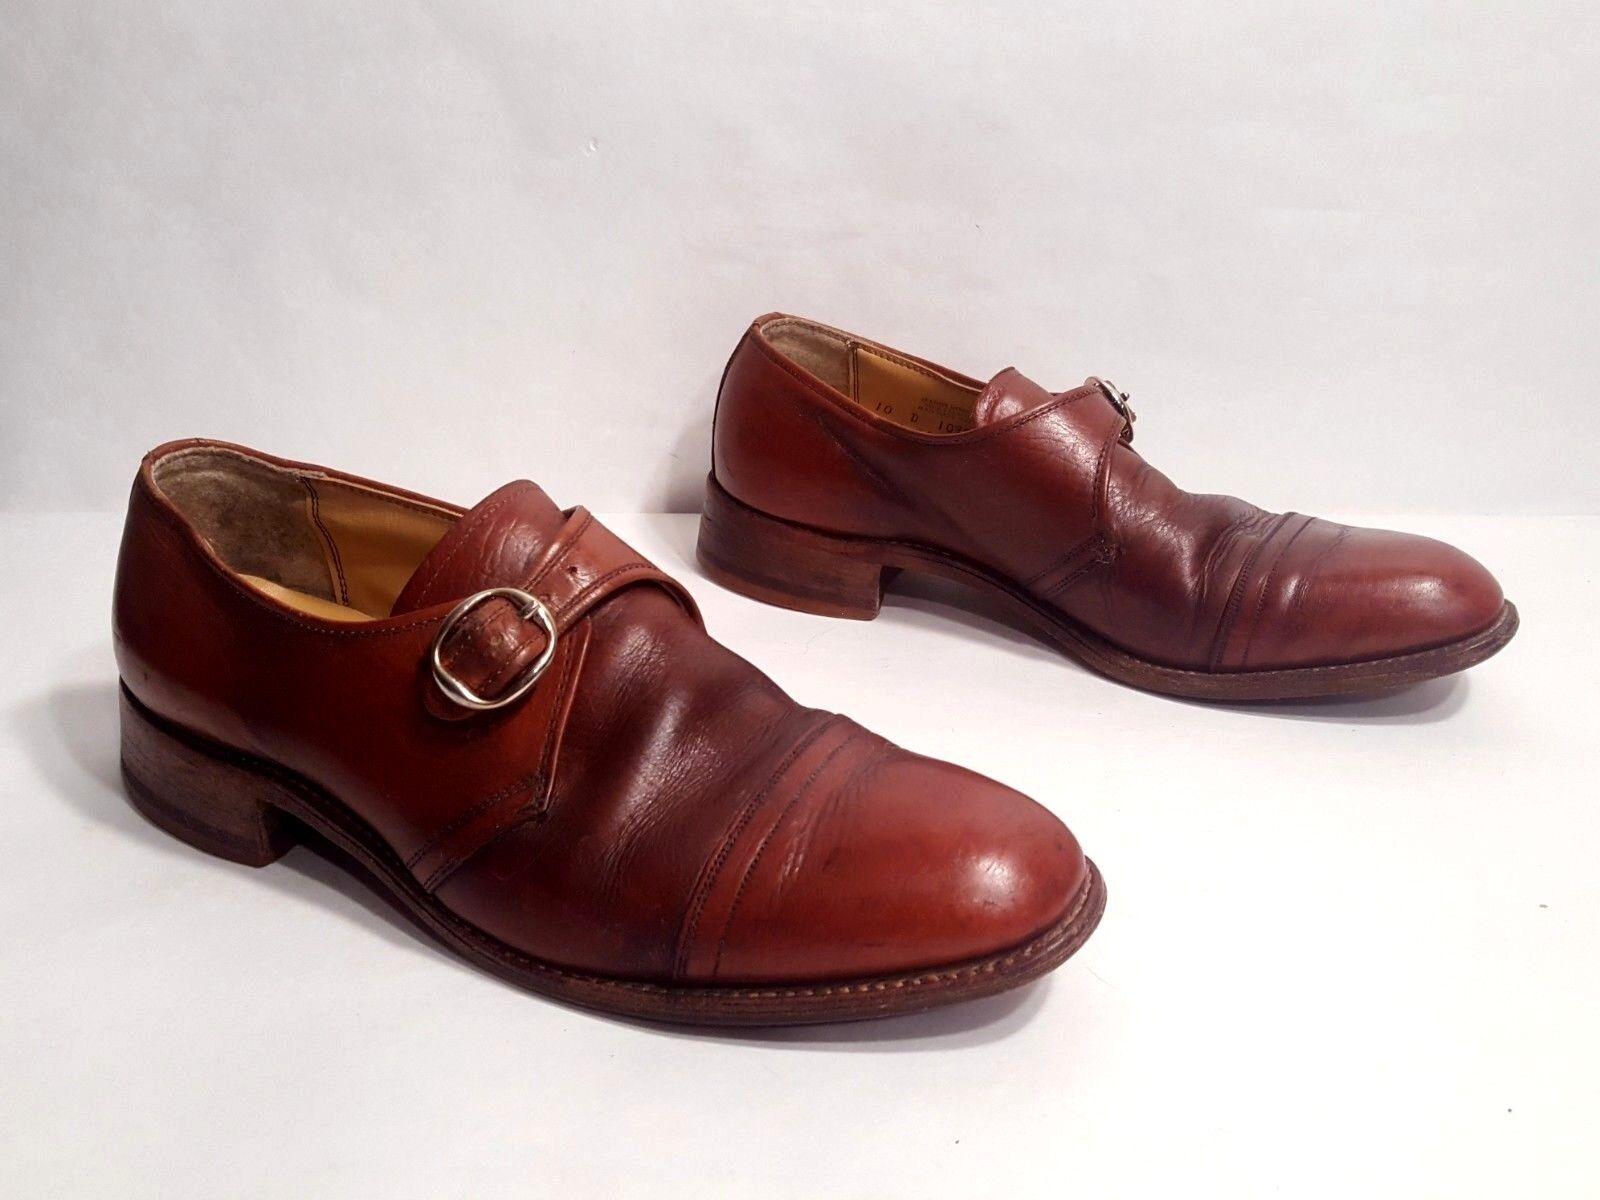 Vtg 1950s Florsheim Mahogany Leather Monk Strap Buckle Cap Toe Loafers scarpe 10D